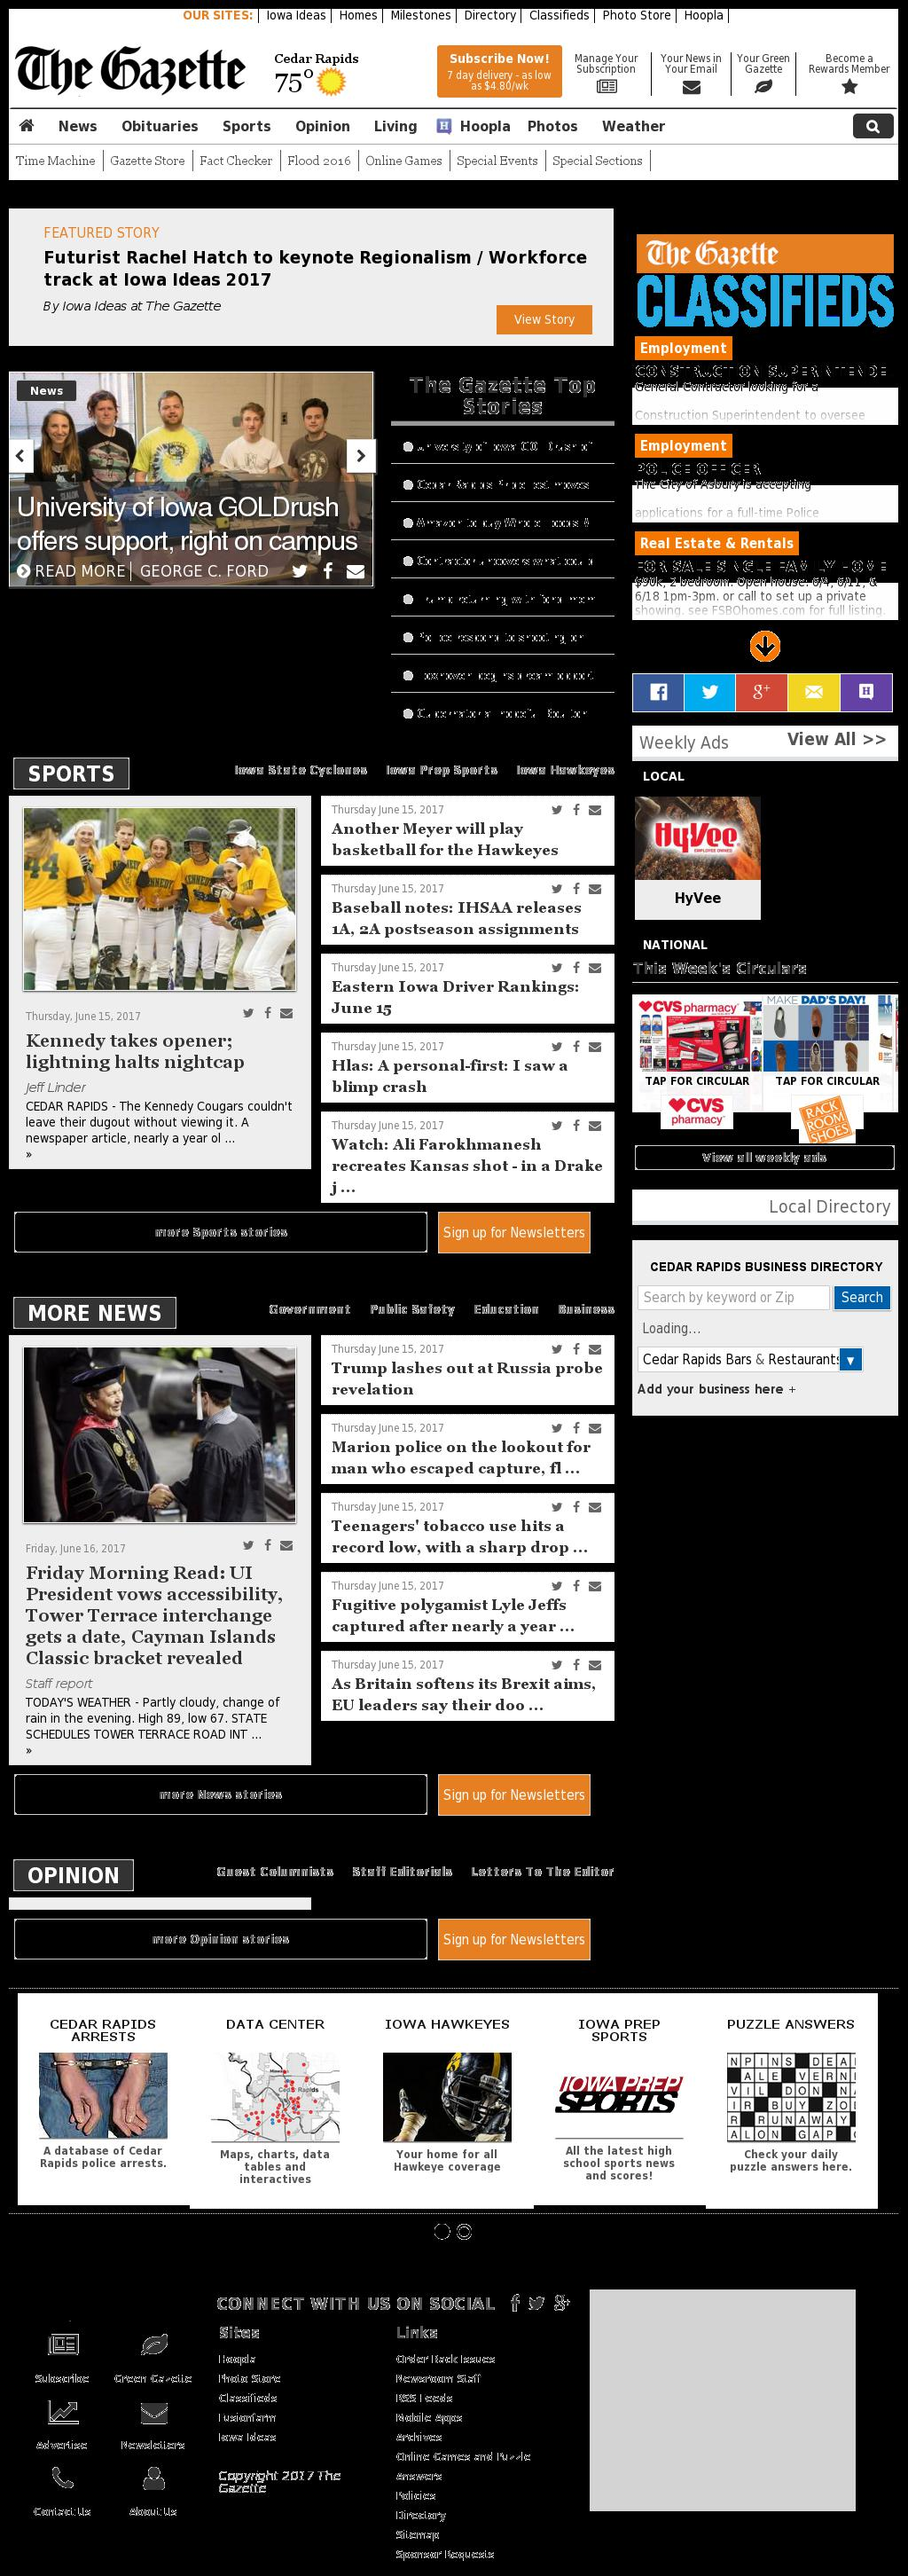 The (Cedar Rapids) Gazette at Friday June 16, 2017, 3:09 p.m. UTC